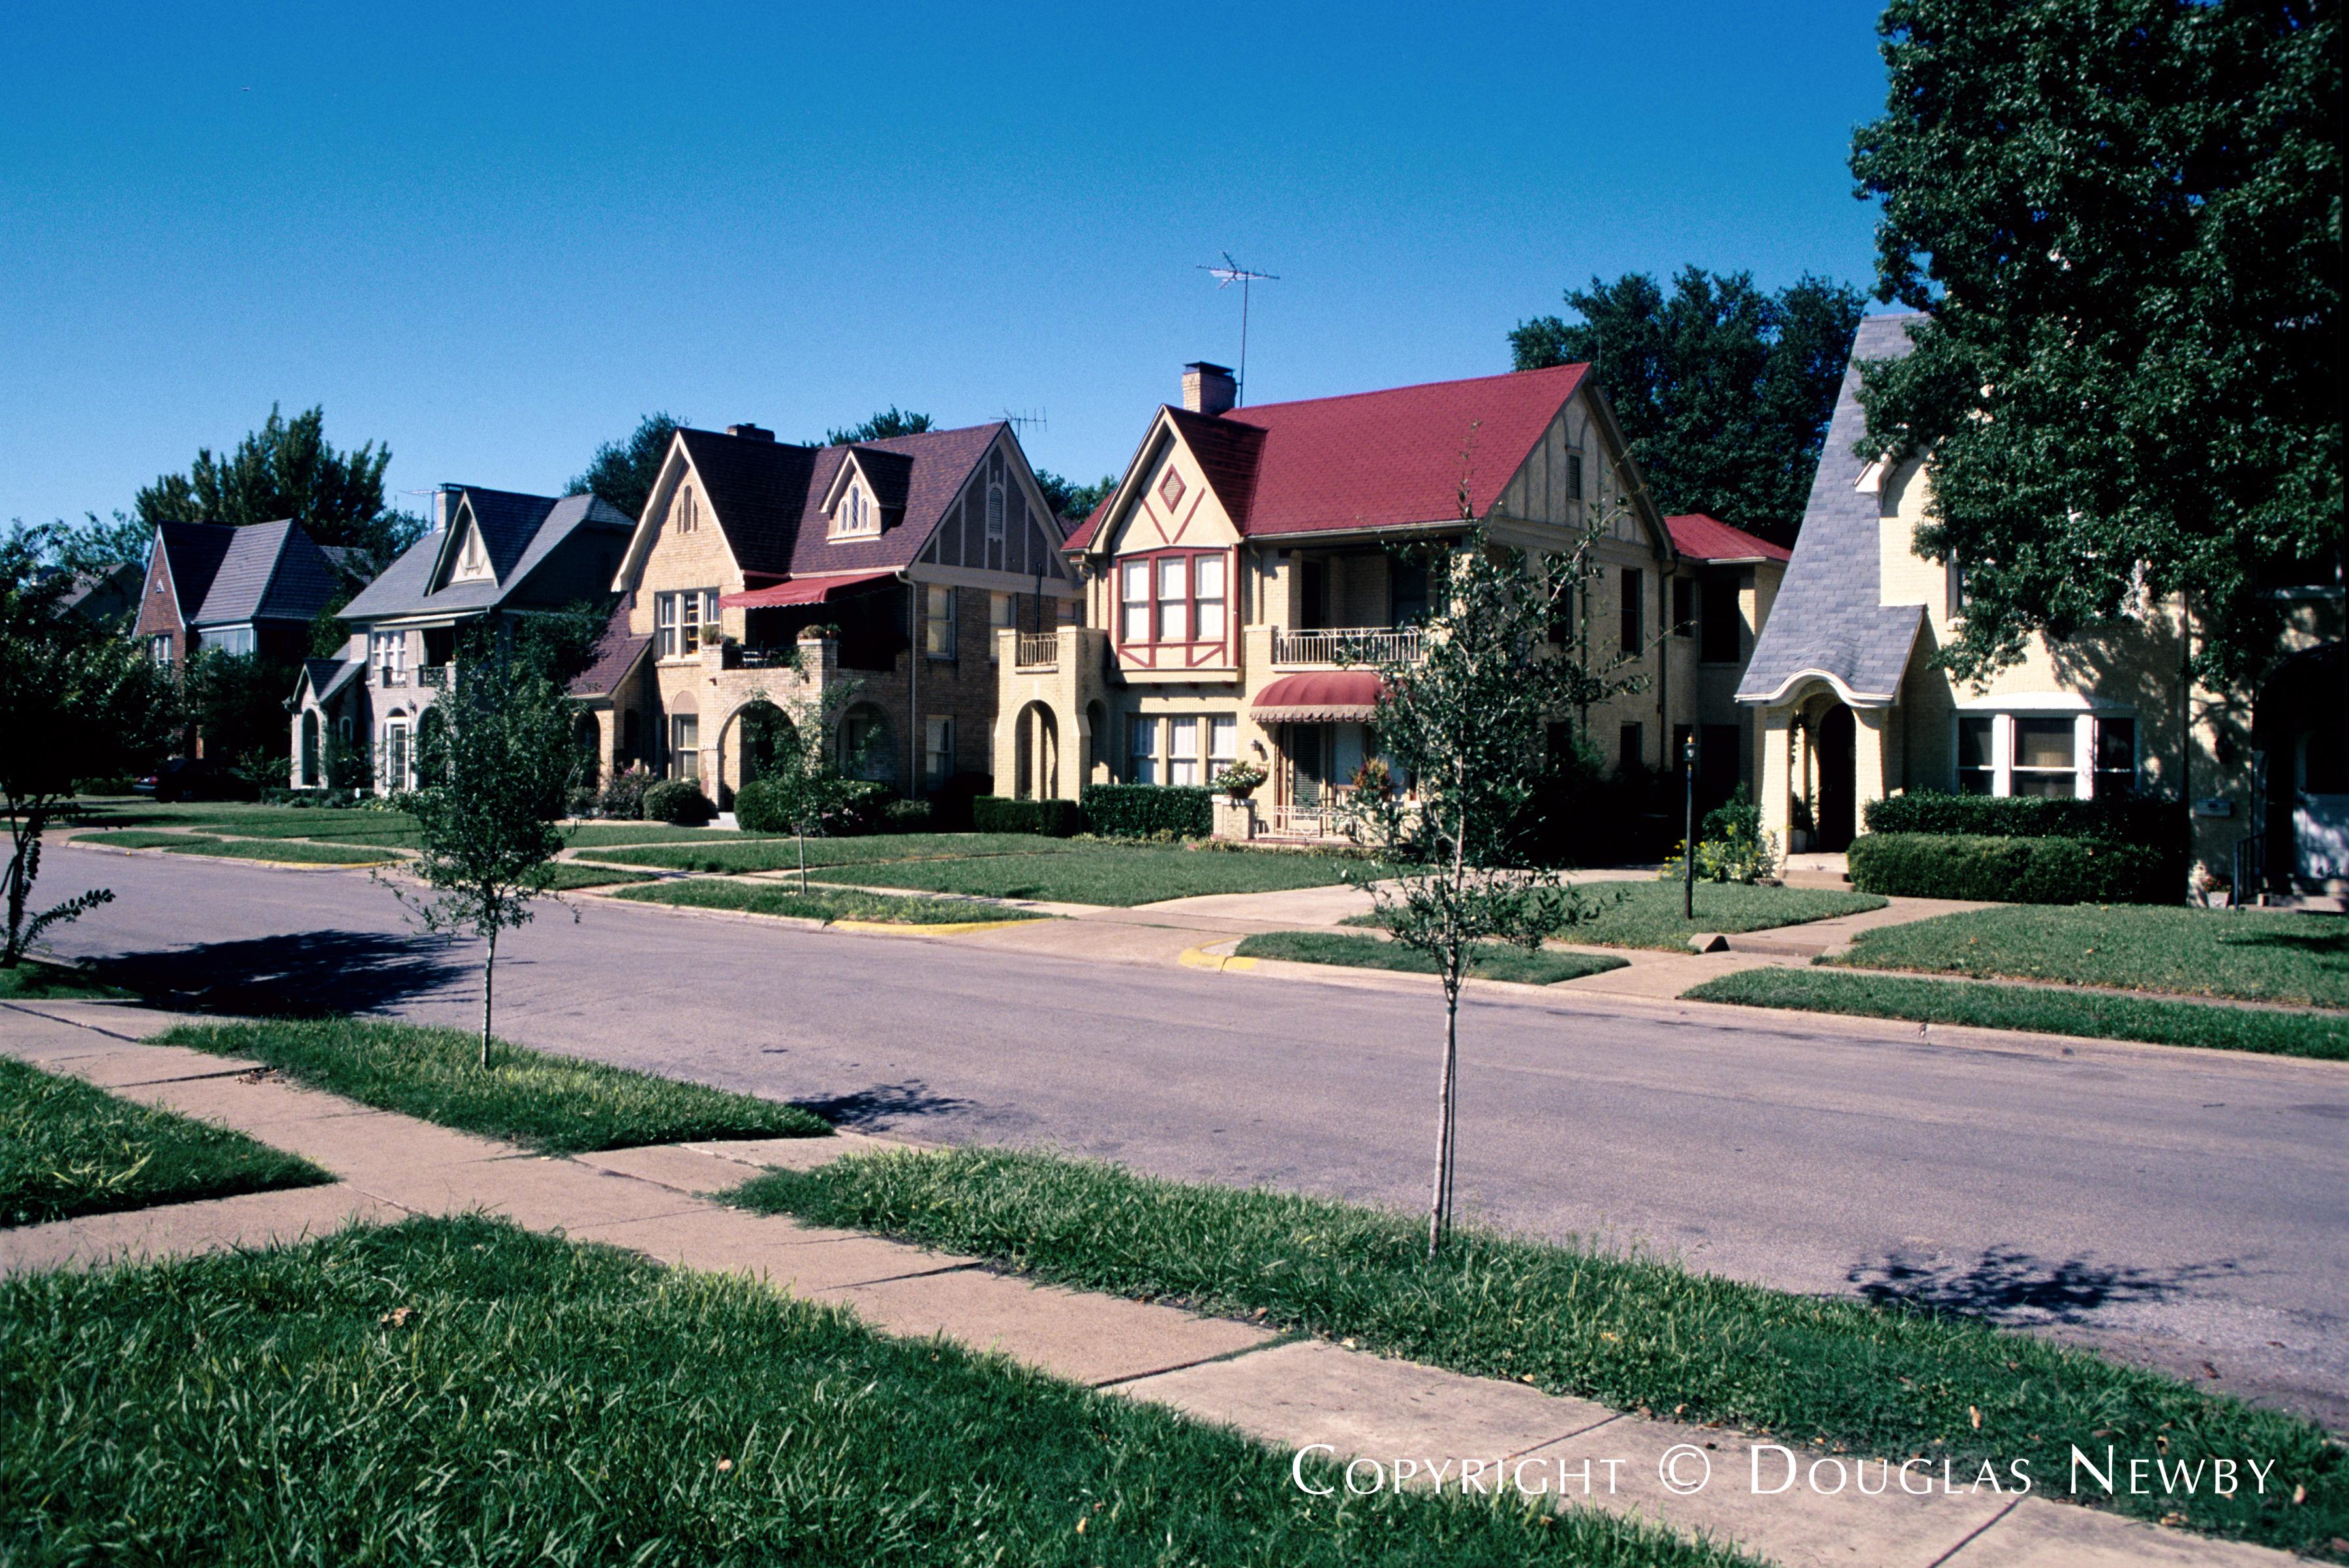 University Park Architecturally Significant Duplex In University Park Neighborhood Normandy Duplex On Normandy Block Dallas Texas